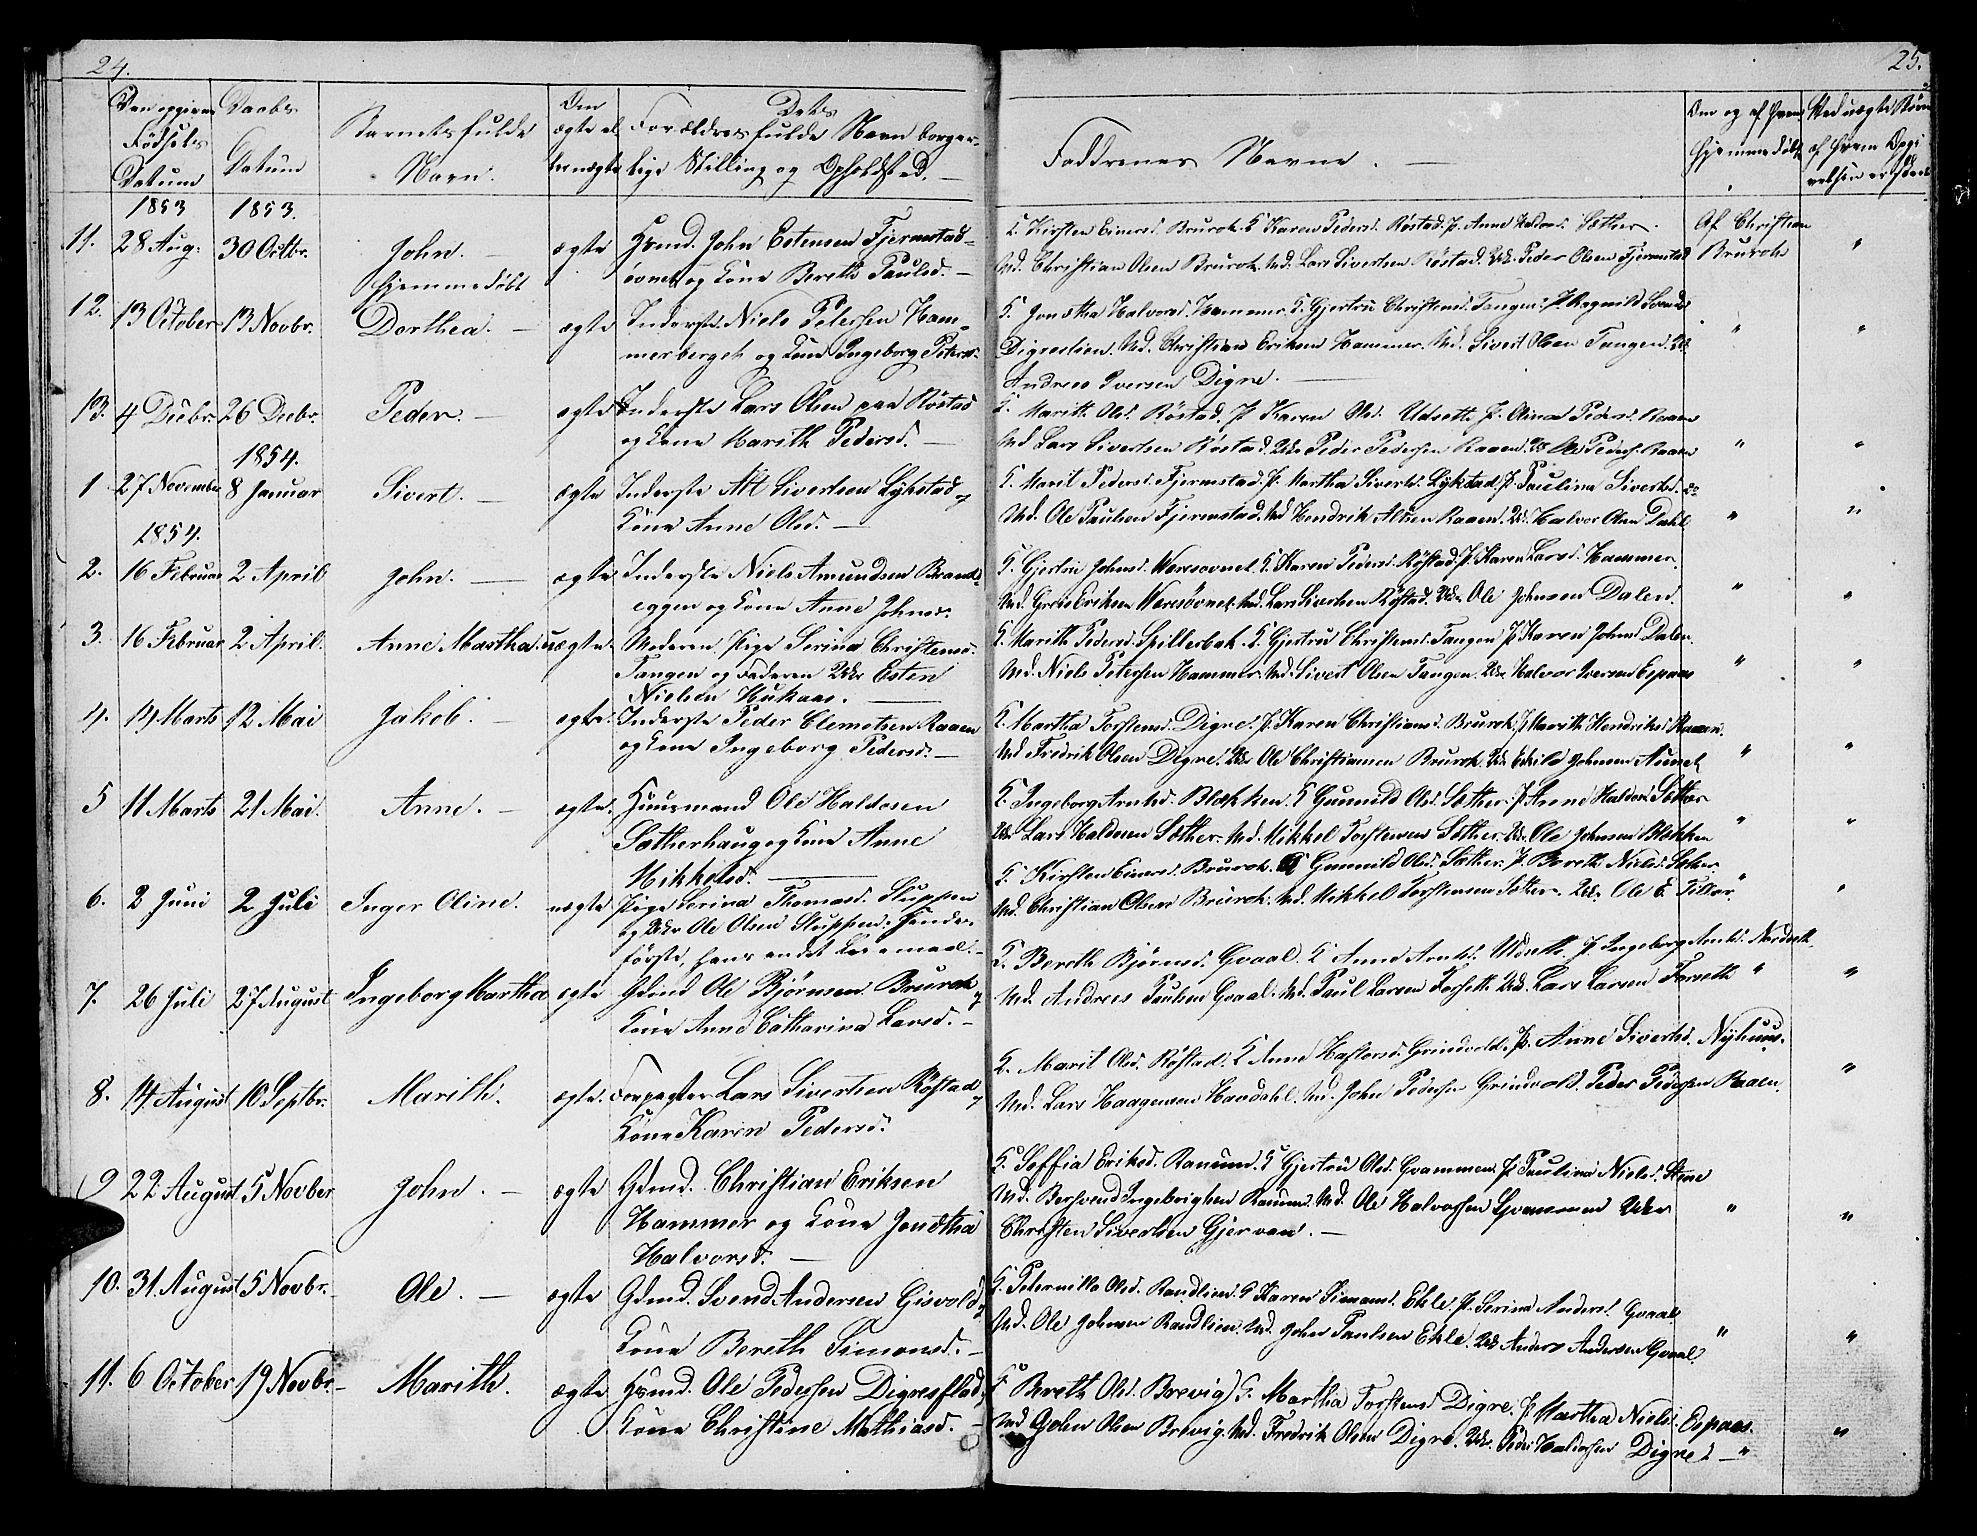 SAT, Ministerialprotokoller, klokkerbøker og fødselsregistre - Sør-Trøndelag, 608/L0339: Parish register (copy) no. 608C05, 1844-1863, p. 24-25